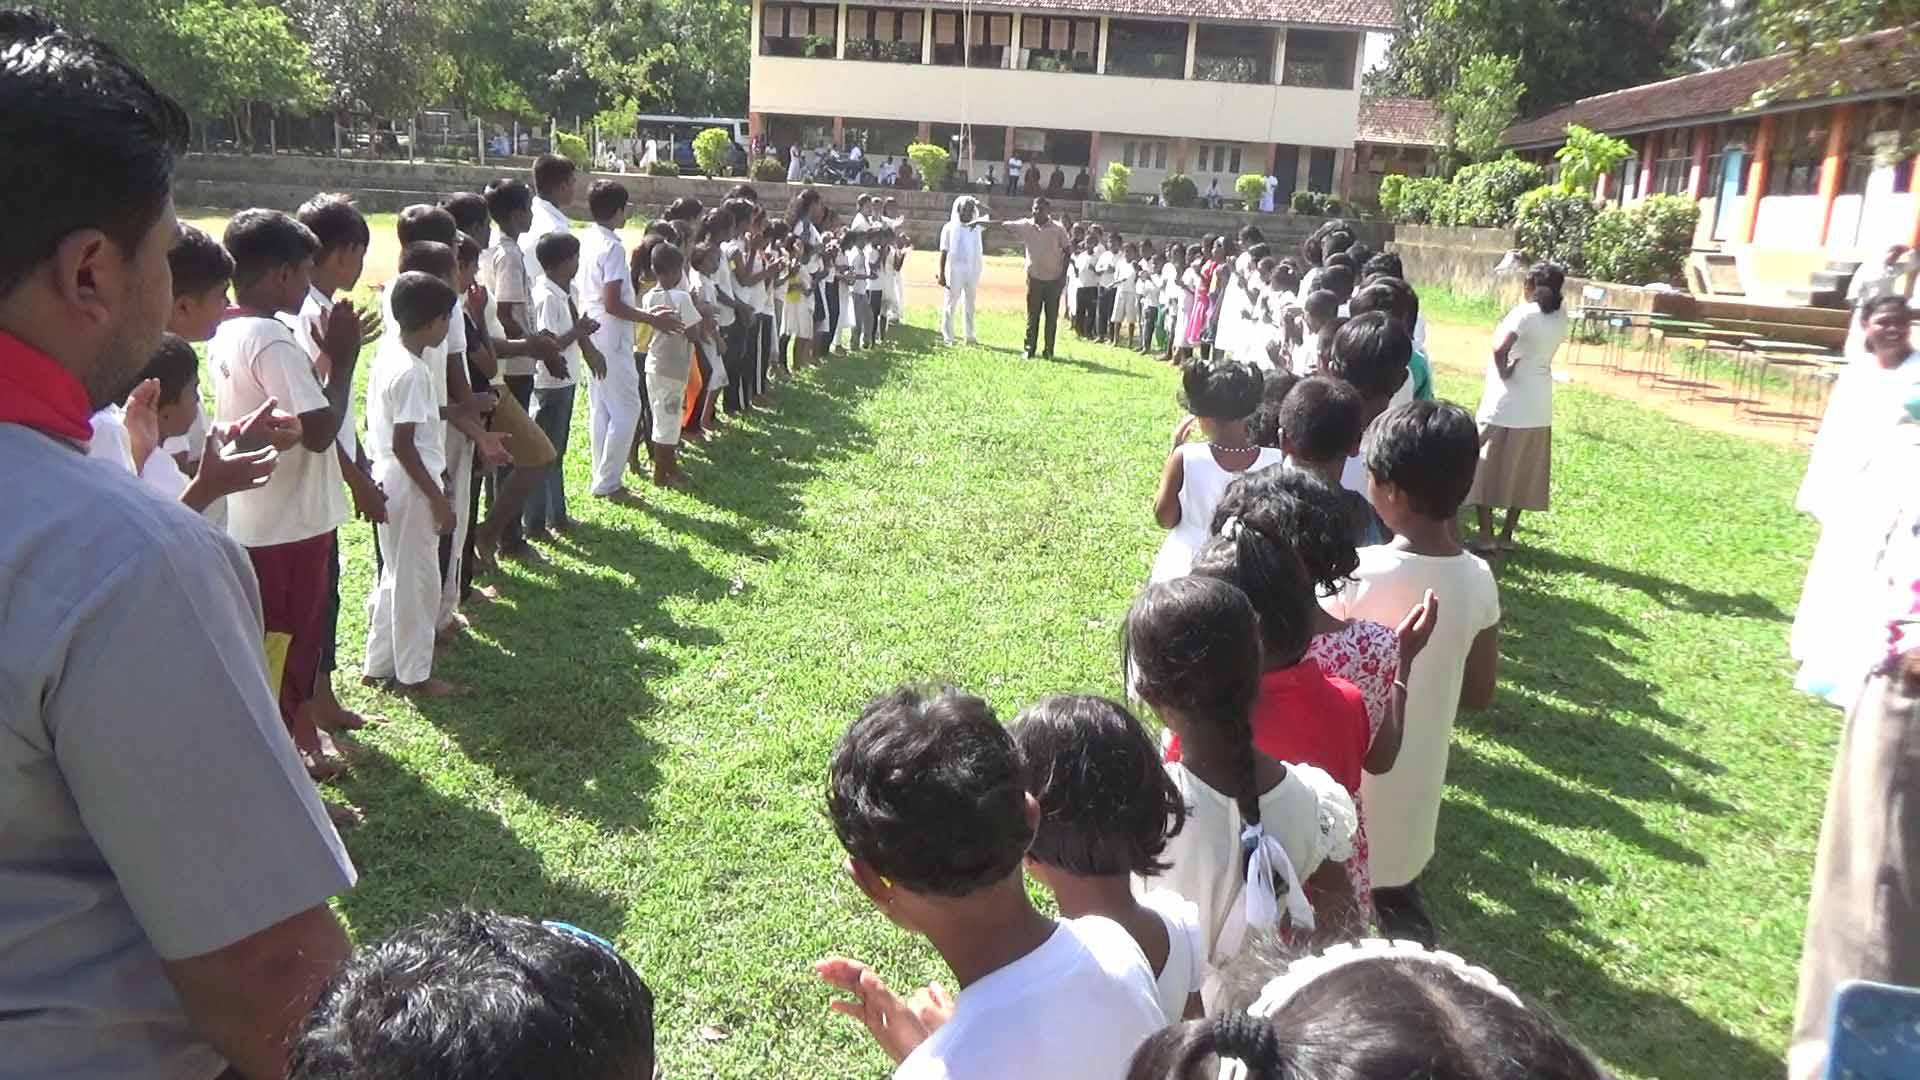 Sati Pasala Mindfulness Camp at Meethirigala Kanishta Vidyalaya-scouting activities (5)